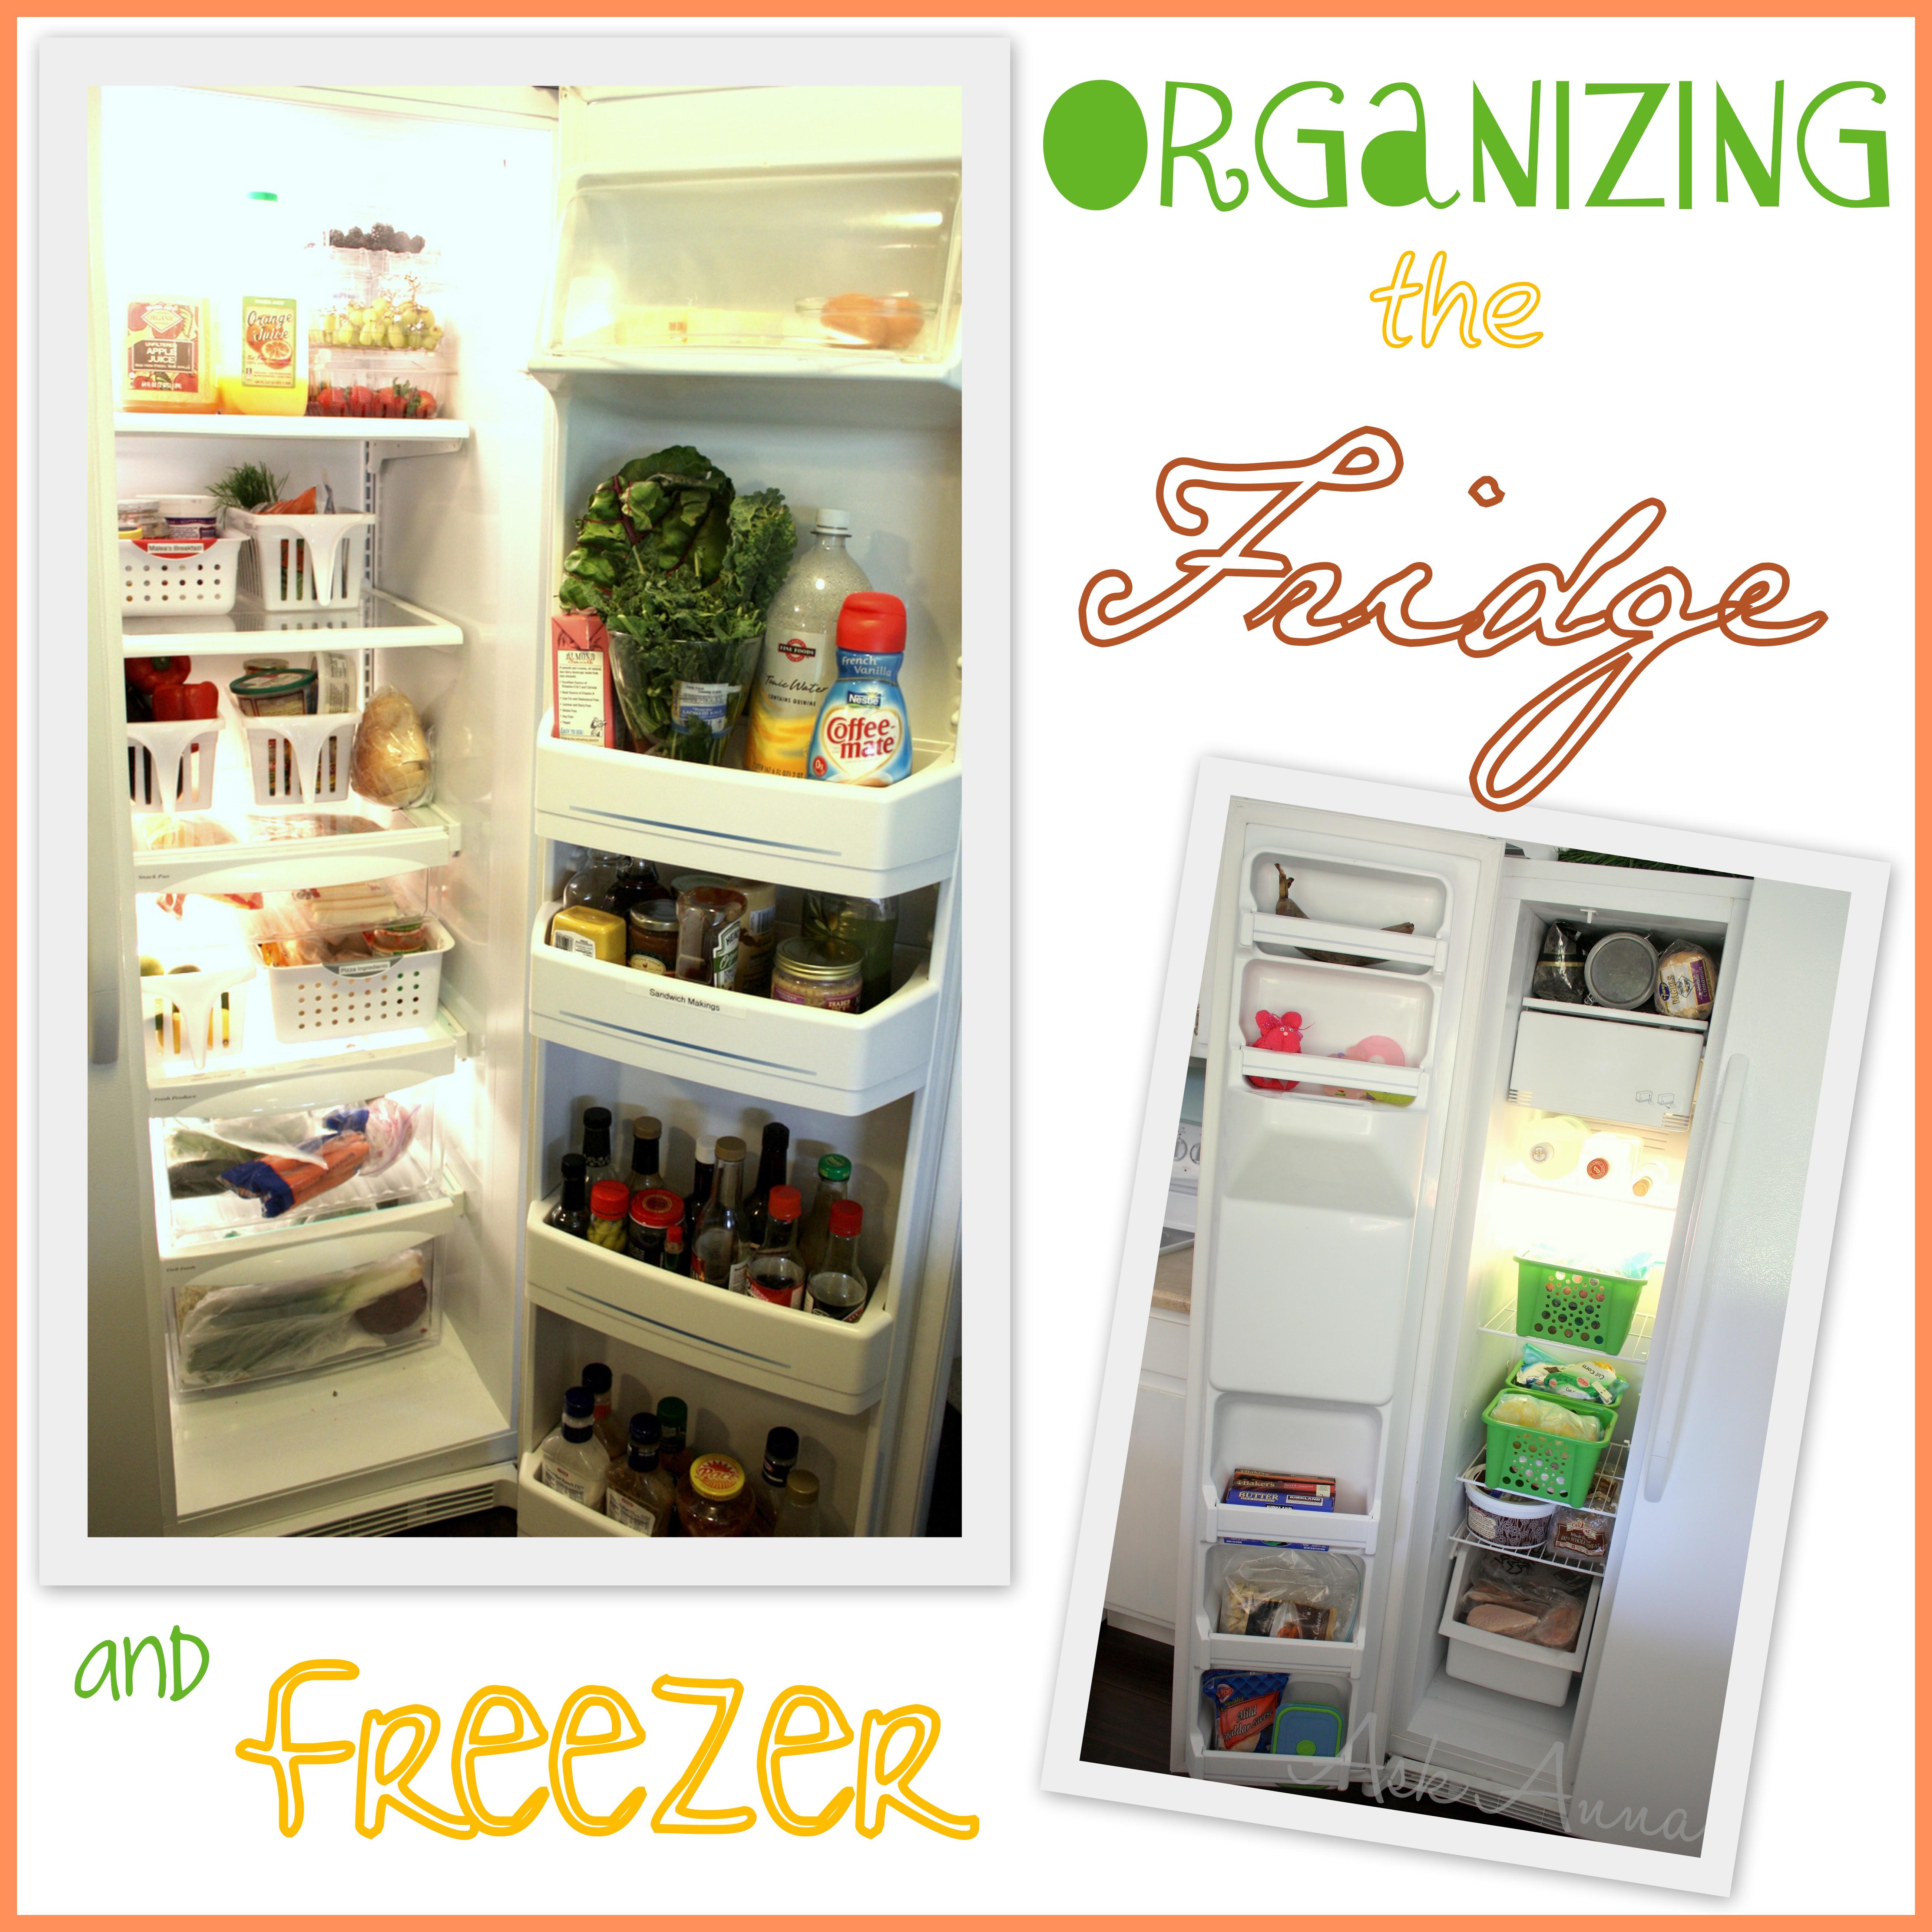 Day #3: Refrigerator Organization & Freezer Help